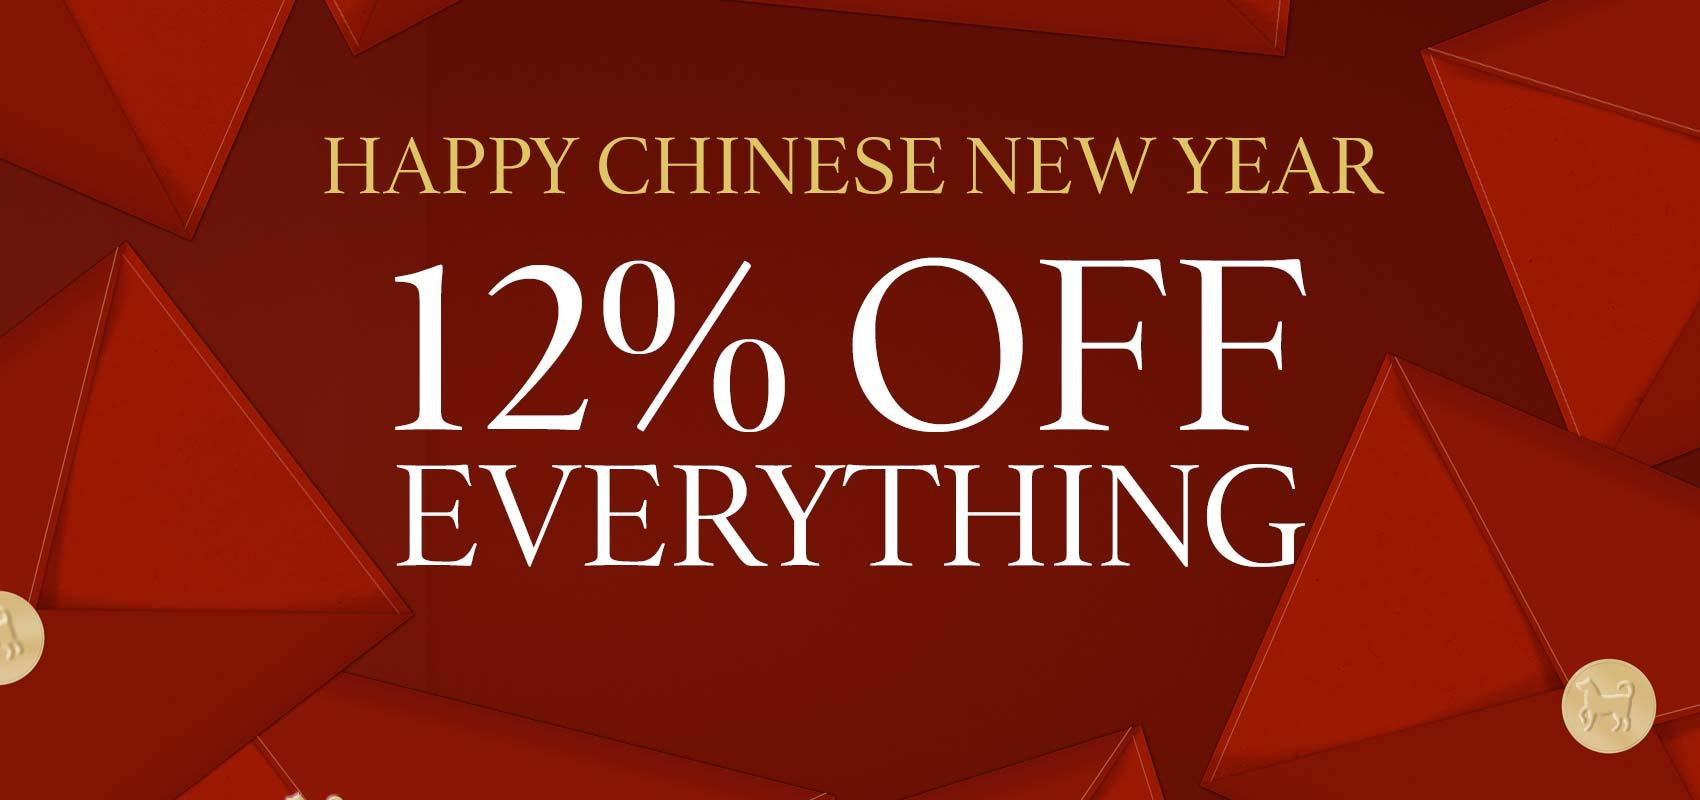 Charles Tyrwhitt Chinese New Year Promotion